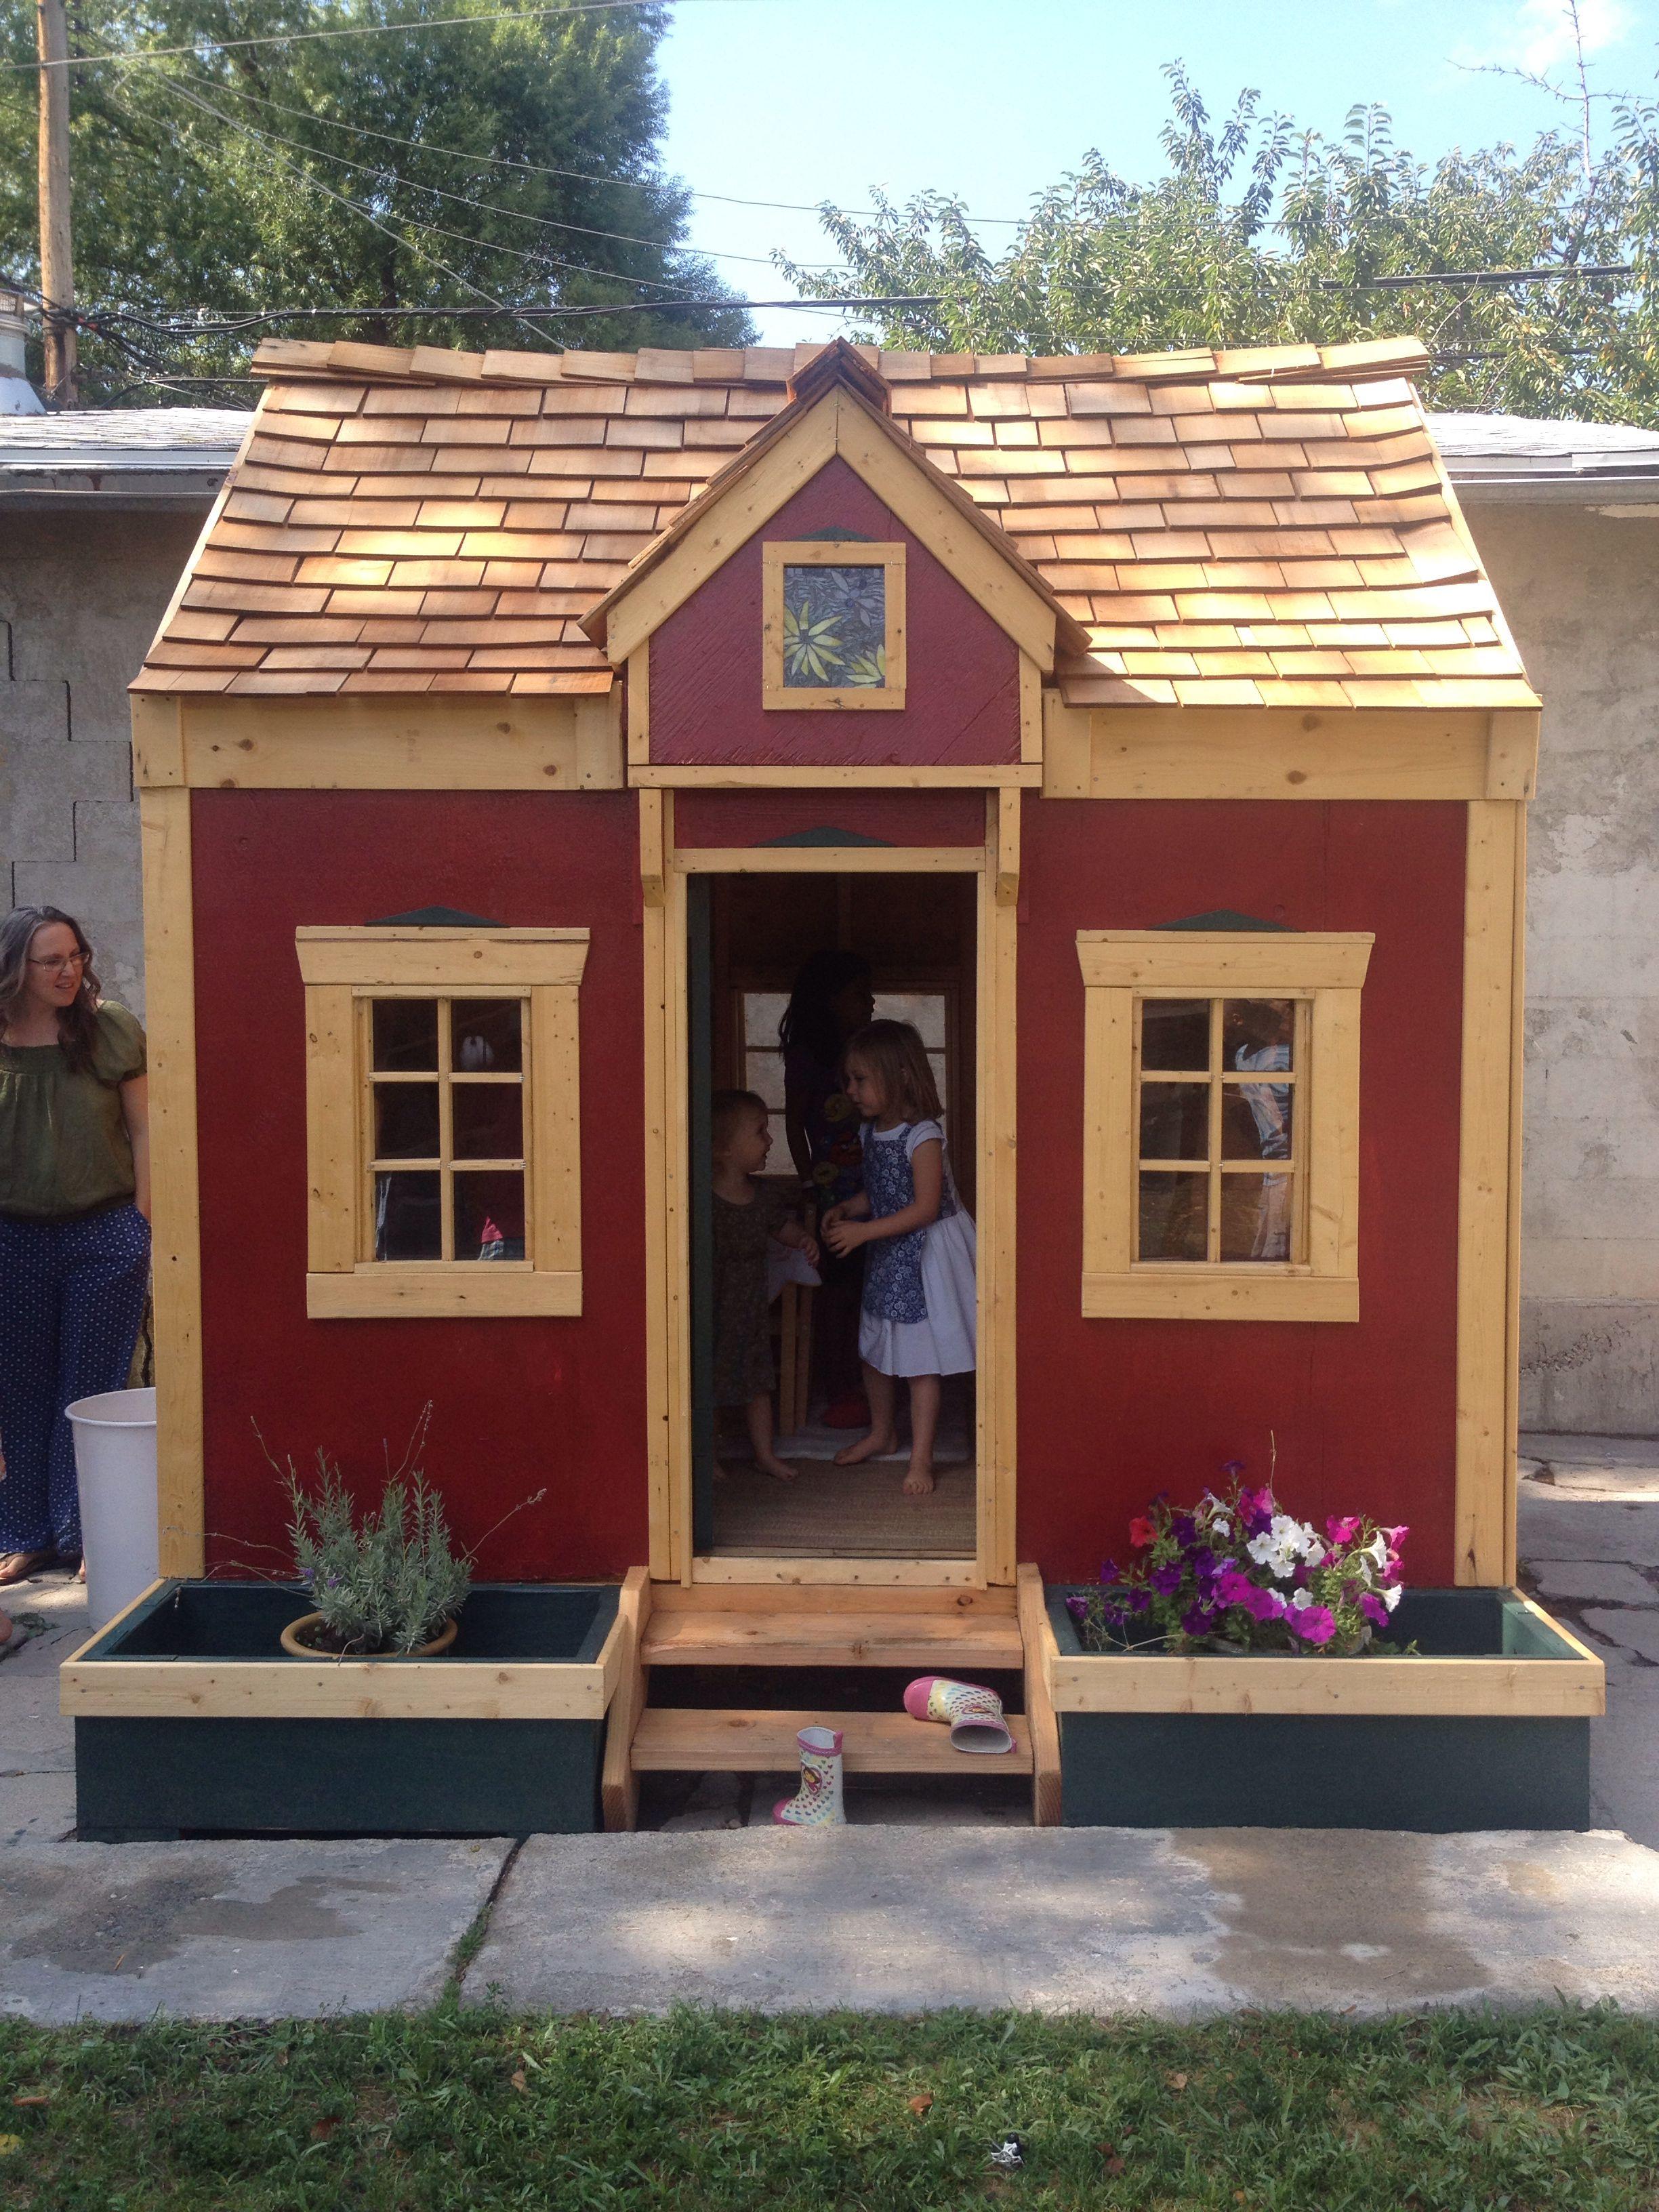 Mini play house, so cute for the kids!!! ❤️